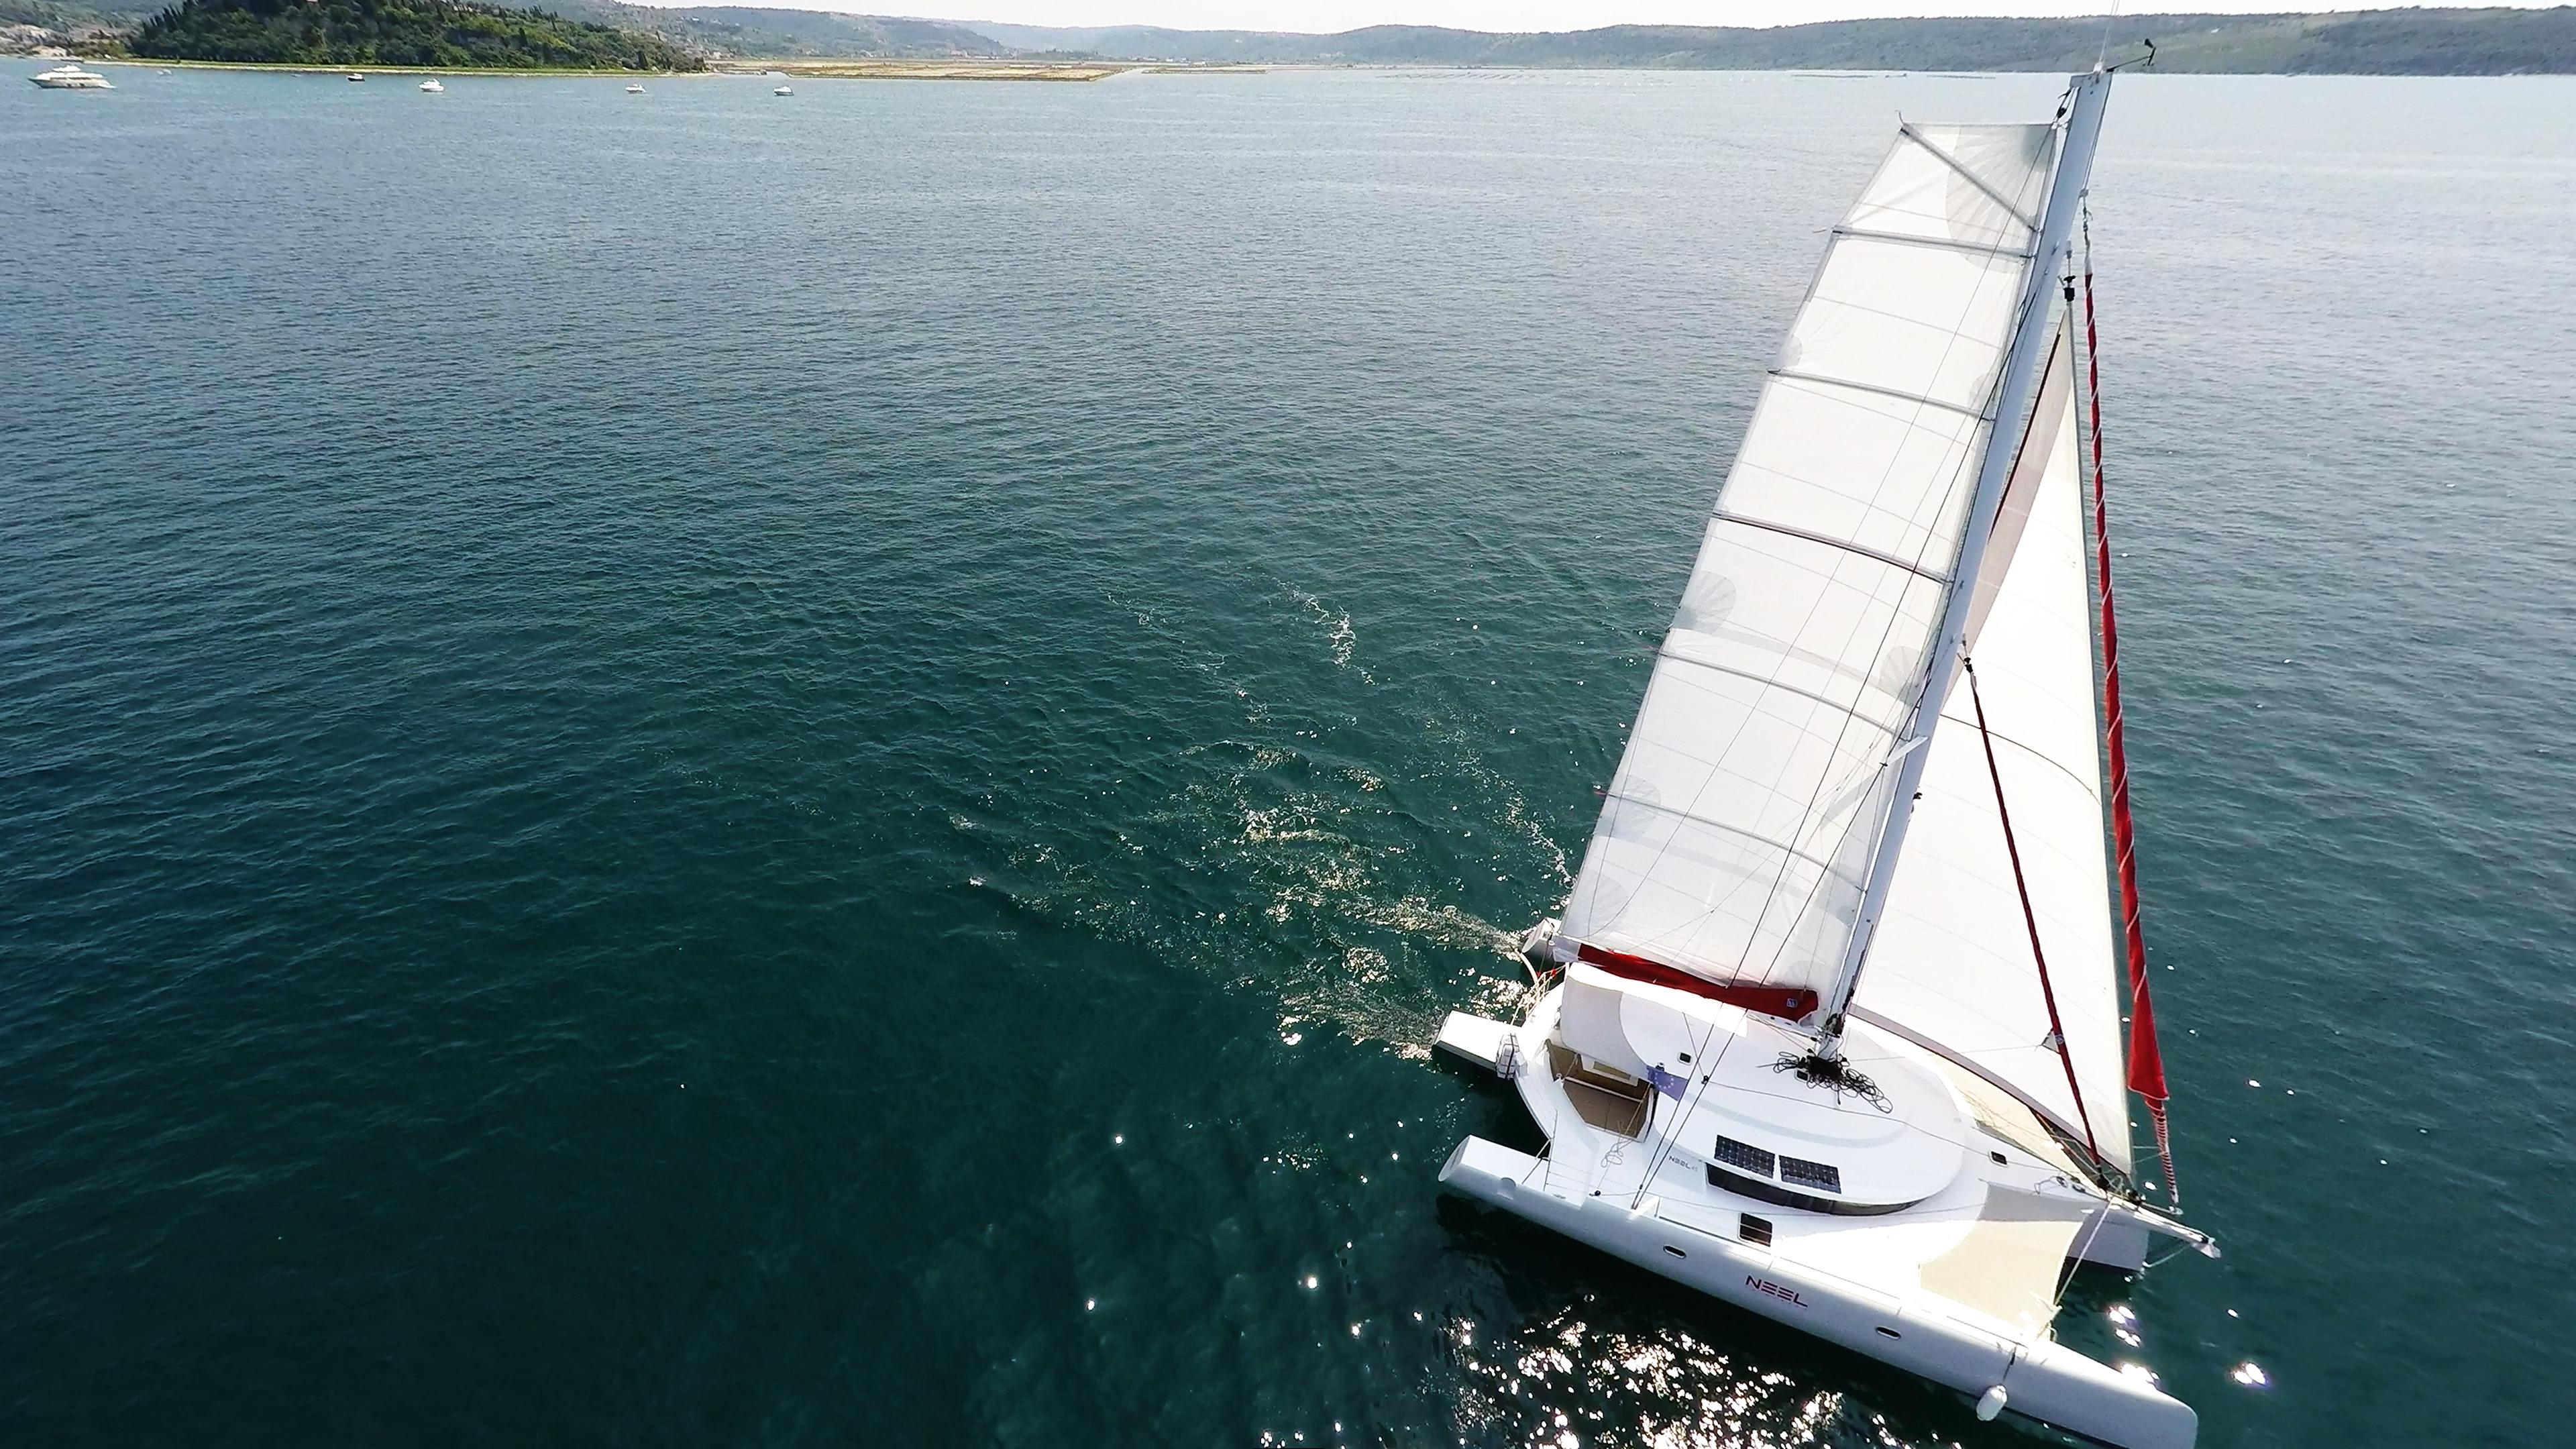 multiscafo noleggio yacht naviga a vela